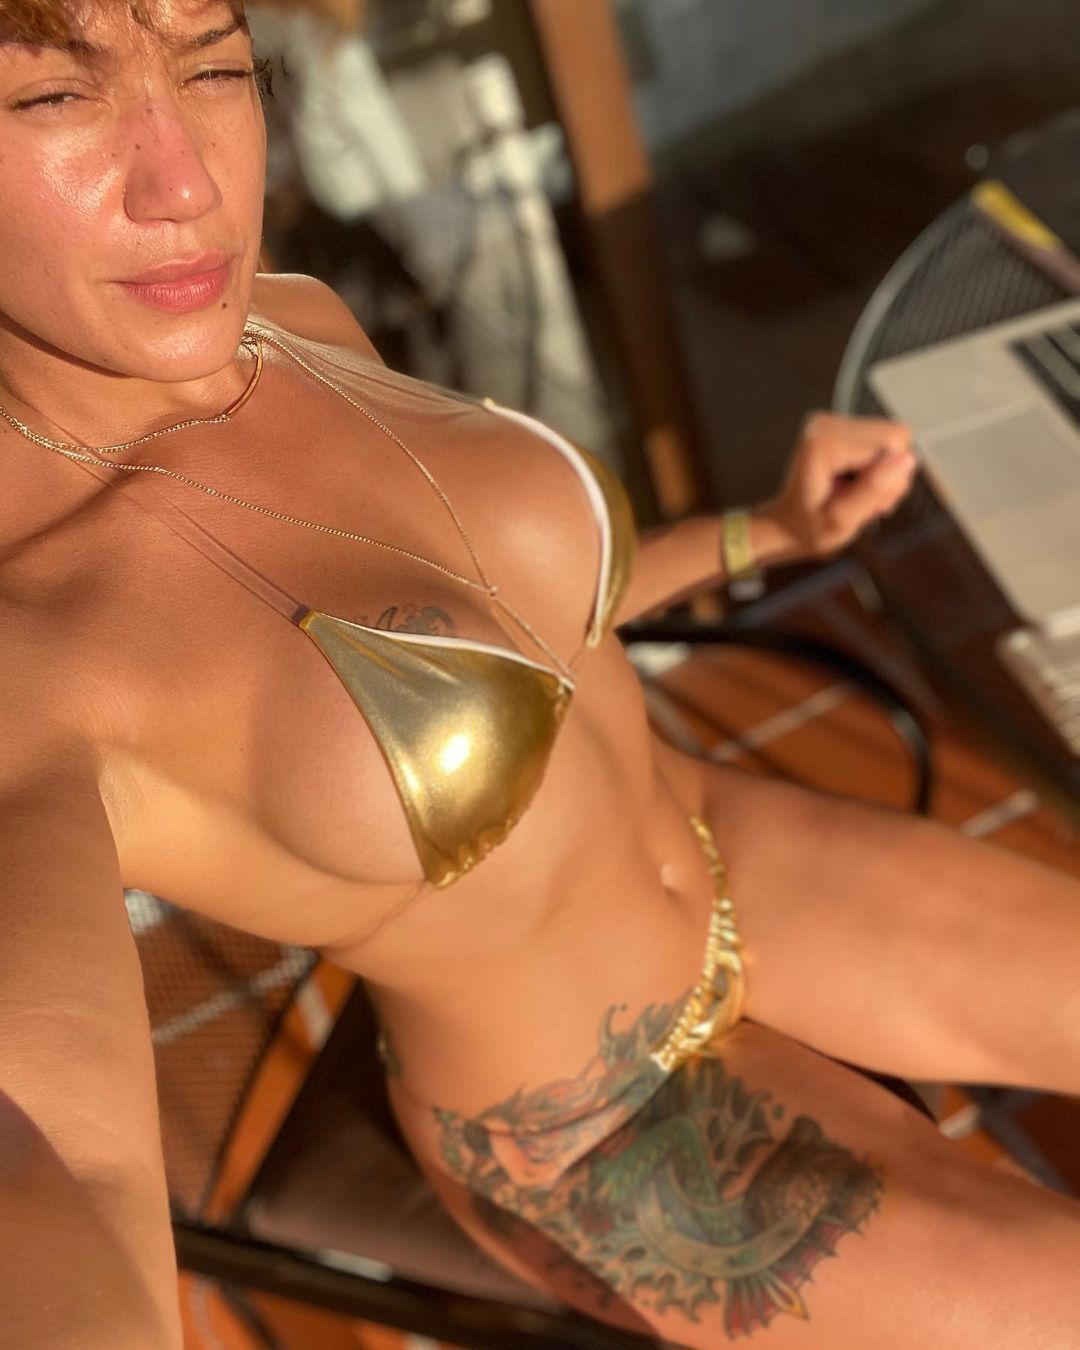 Перл Гонсалес в золотистом бикини